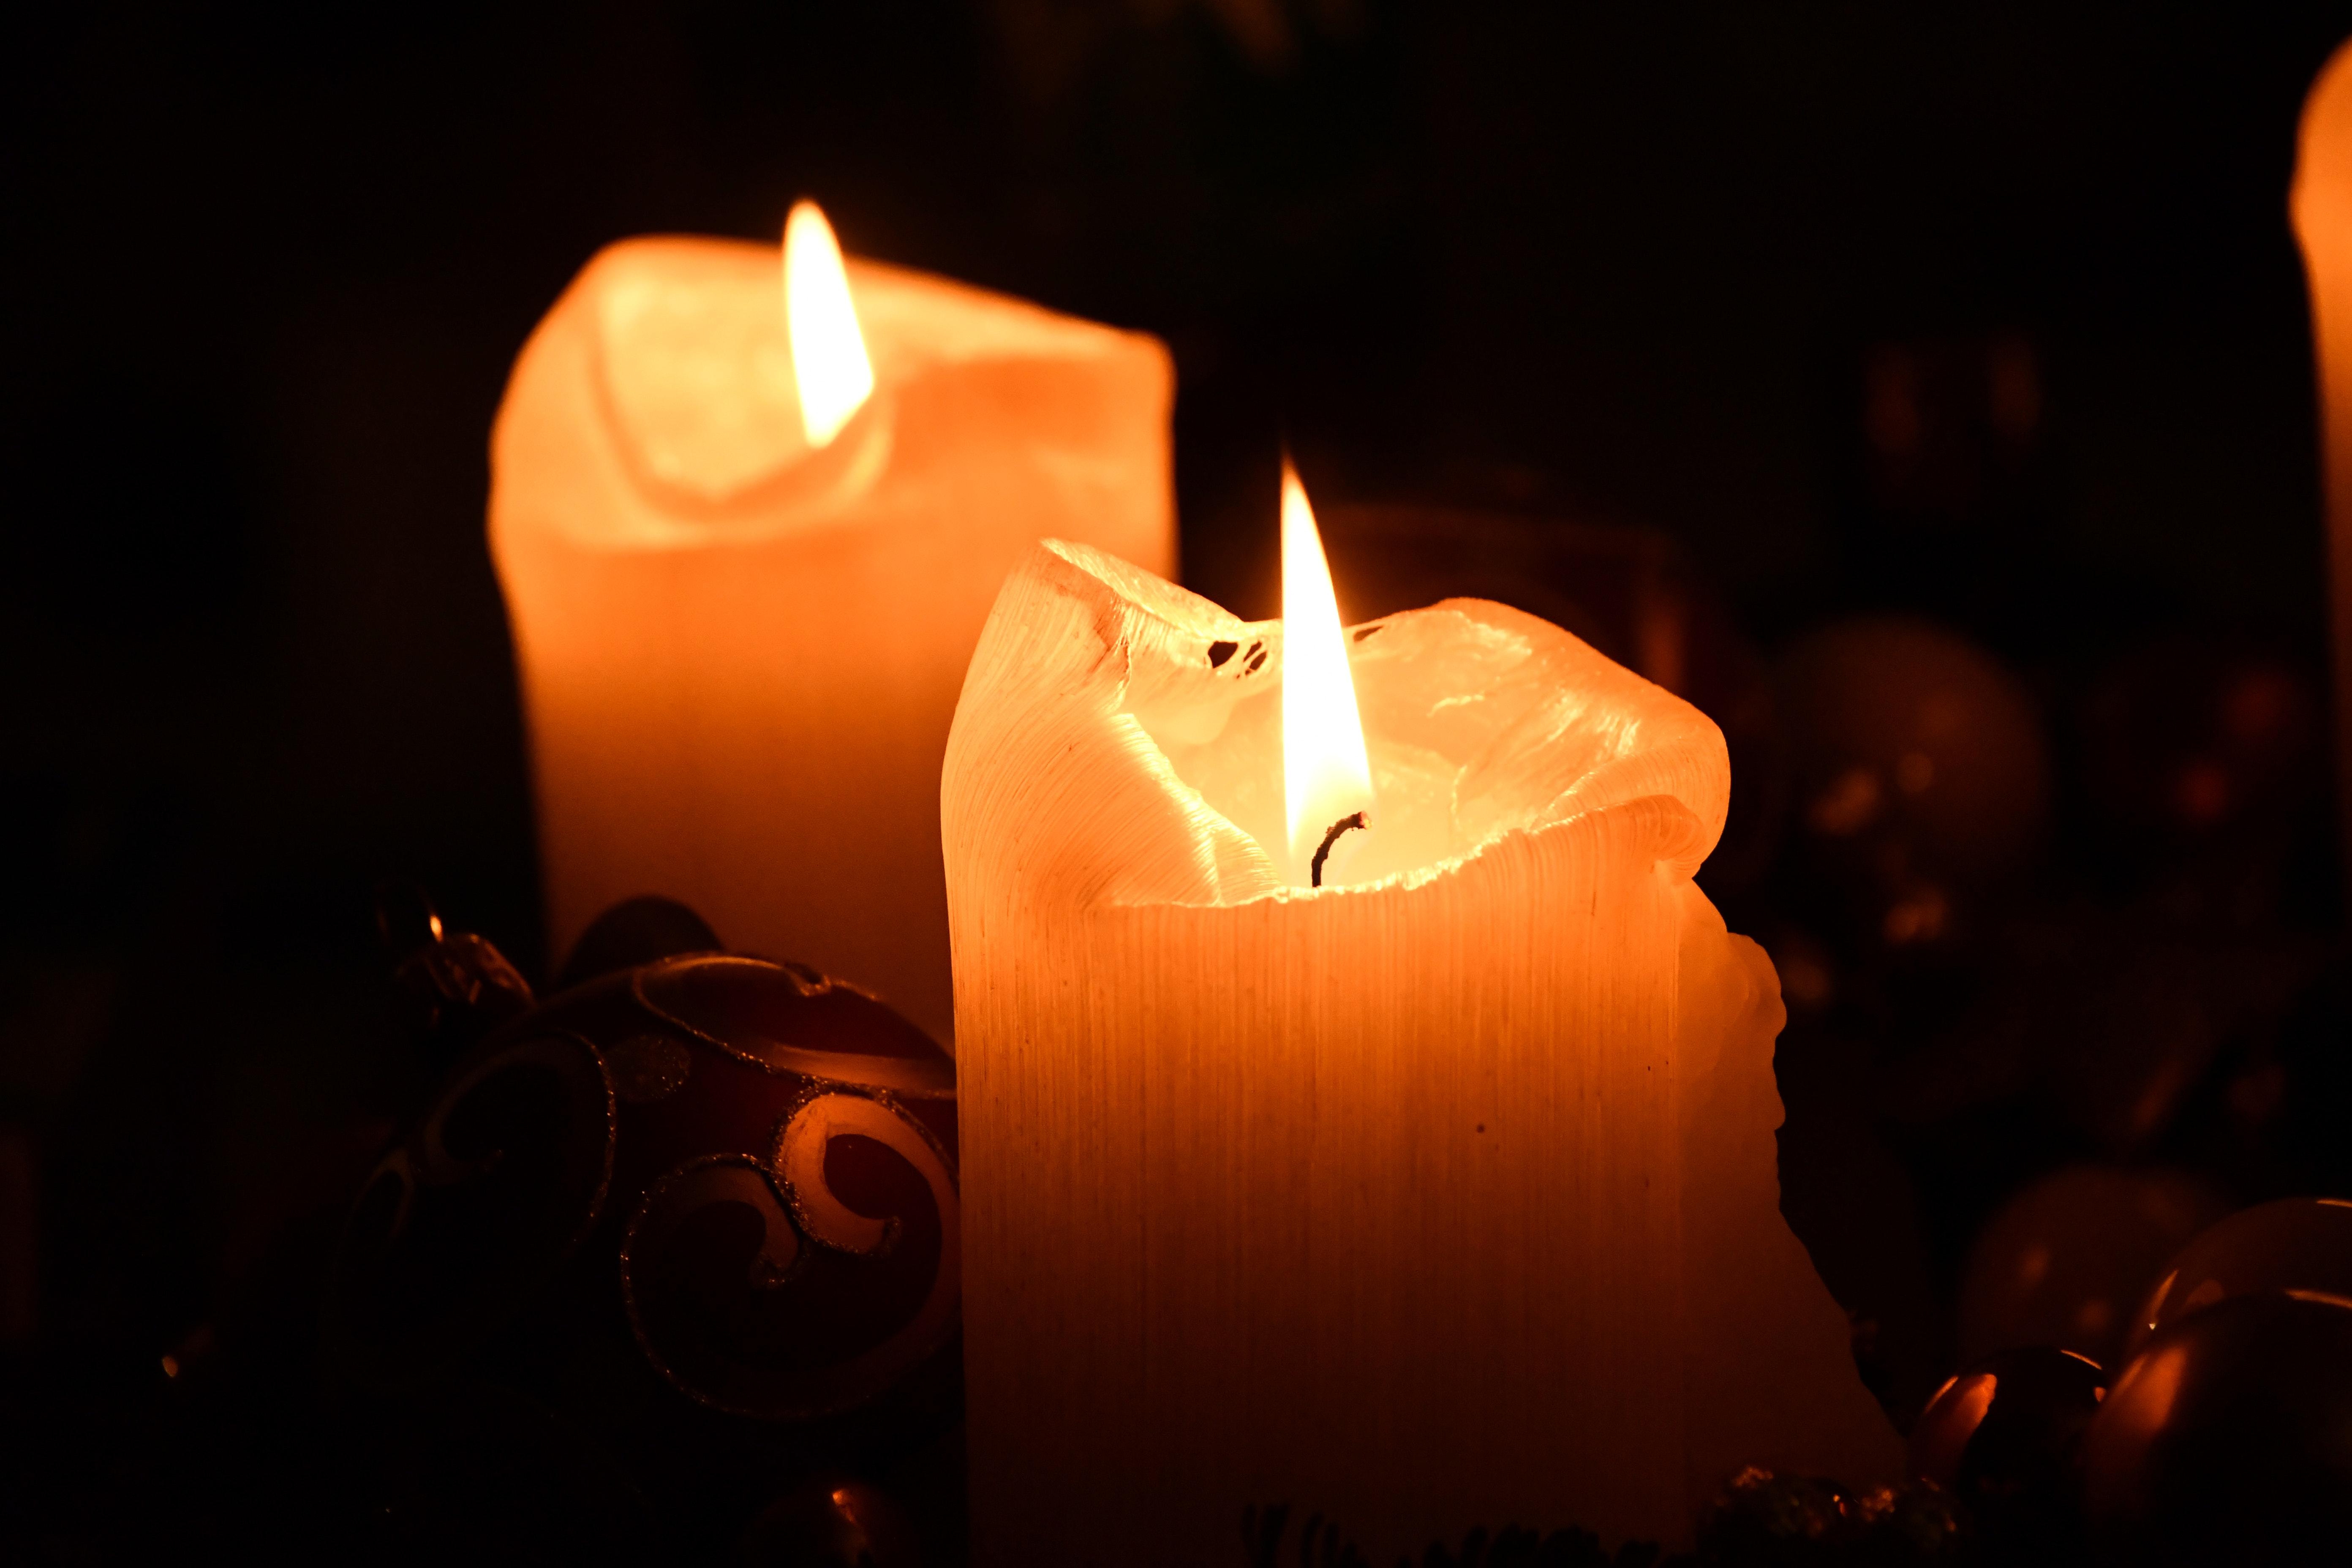 Картинка со свечами, апрелем